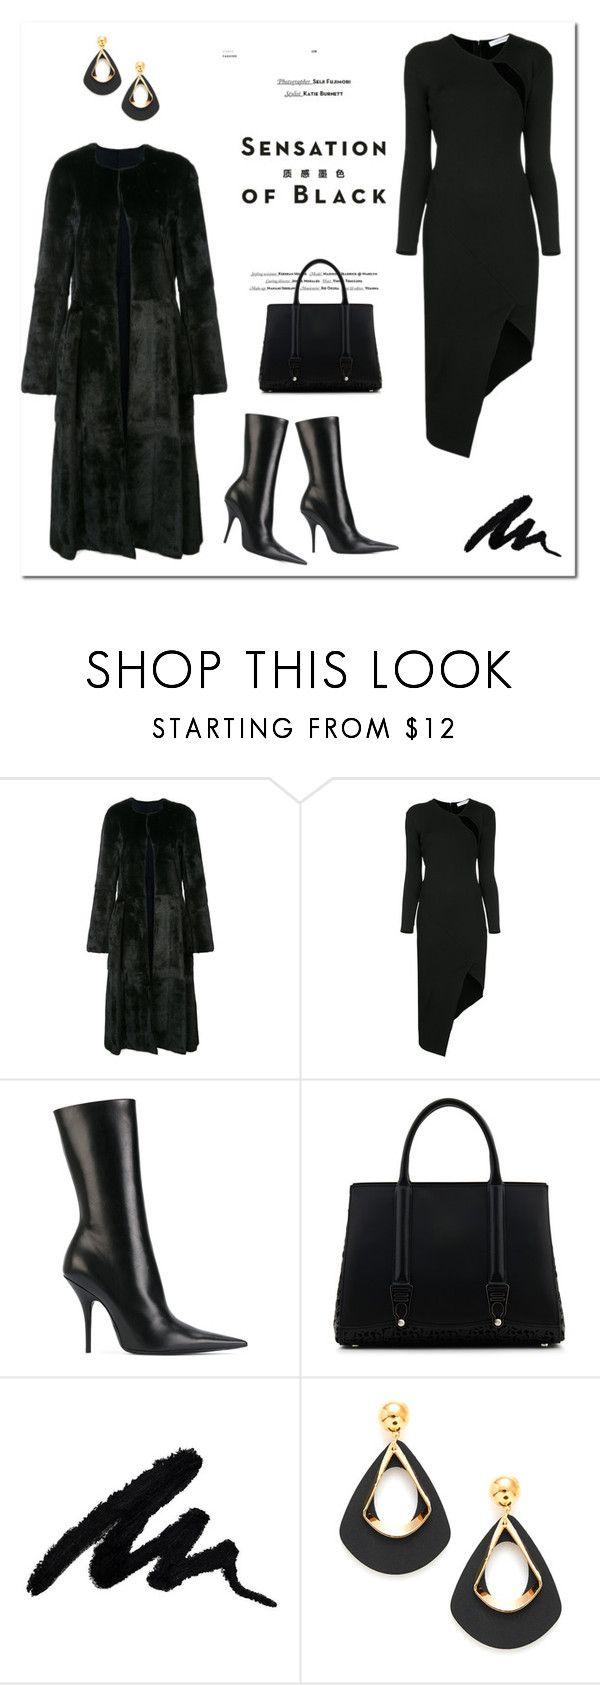 """Mission Monochrome: All-Black Outfit"" by bliznec ❤ liked on Polyvore featuring Oscar de la Renta, Christopher Esber, Balenciaga, Vision, La Perla, polyvoreeditorial, polyvorecontest and allblackoutfit"